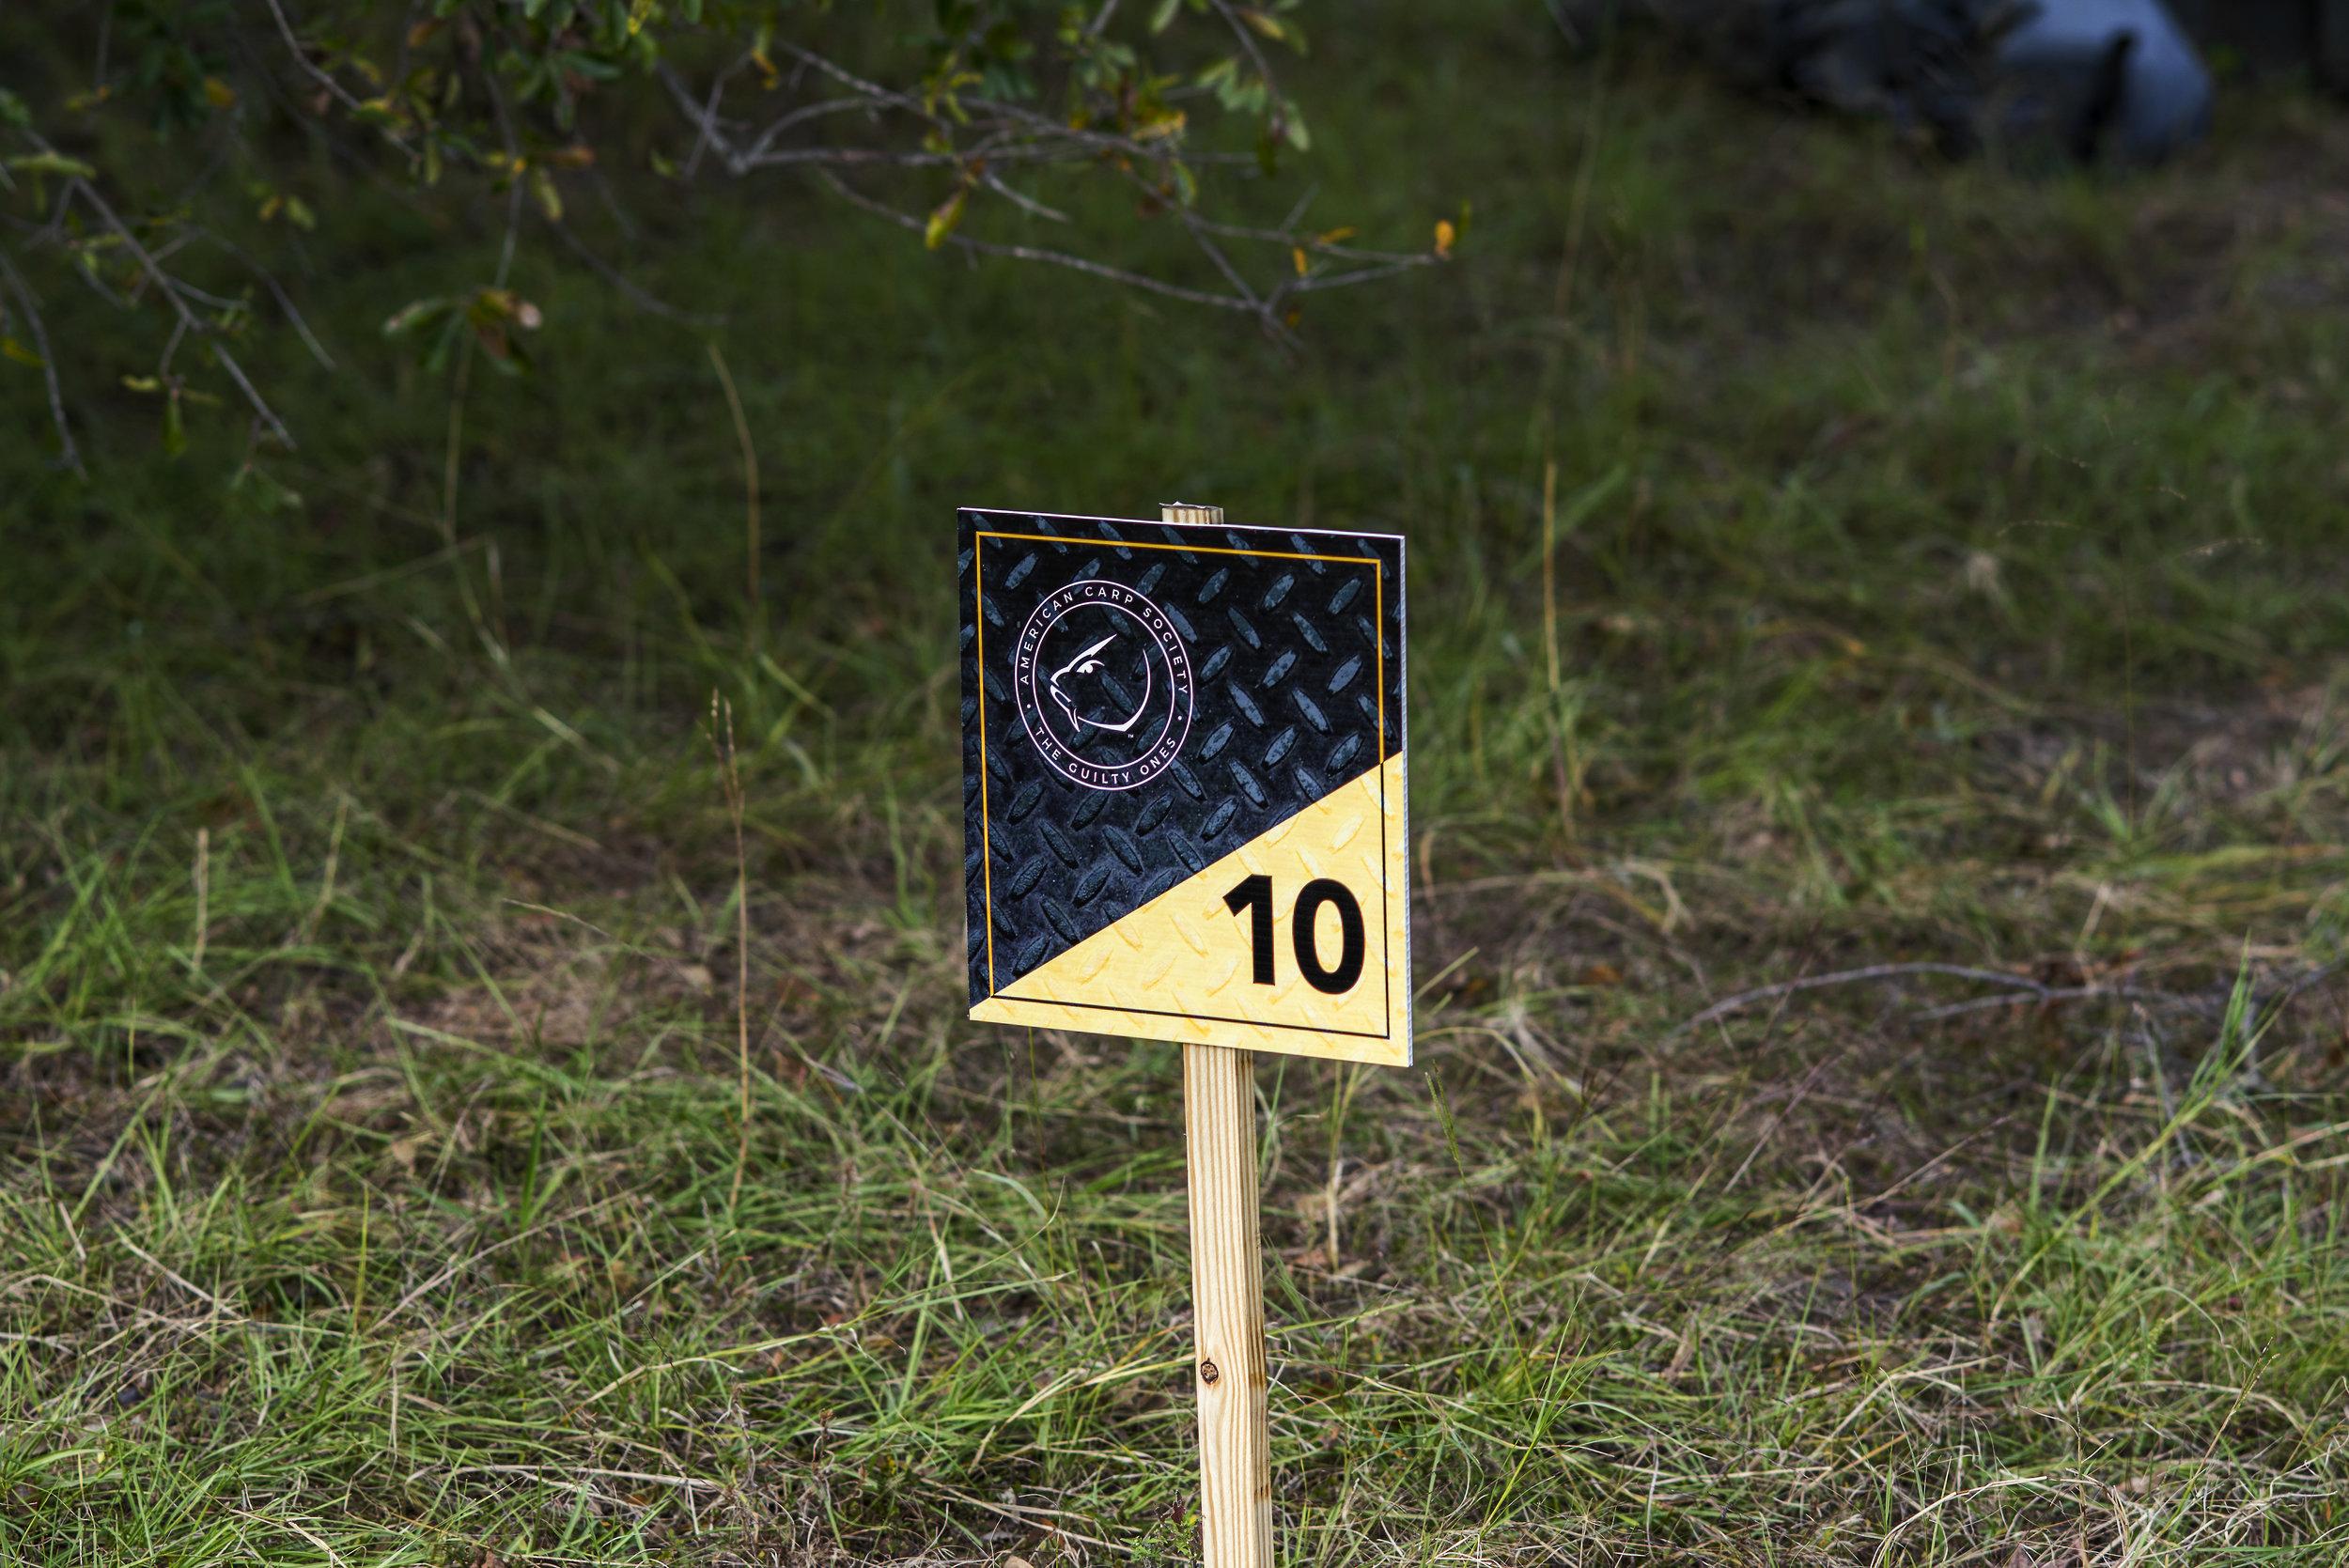 PEG 10 SIGN.jpg